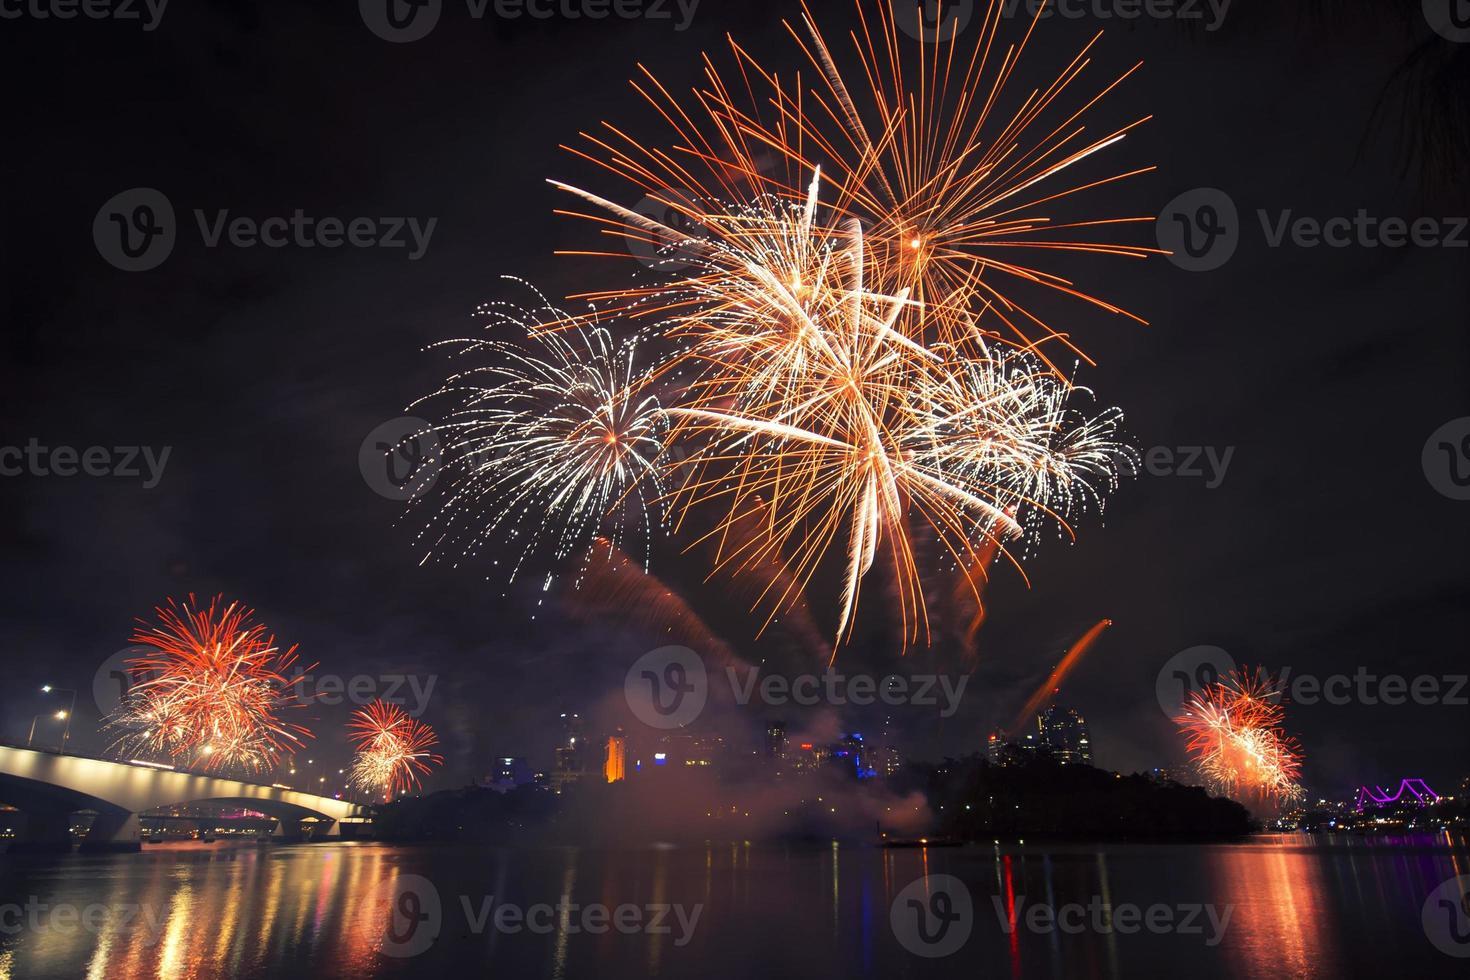 riverfire festival i brisbane - 2014 foto